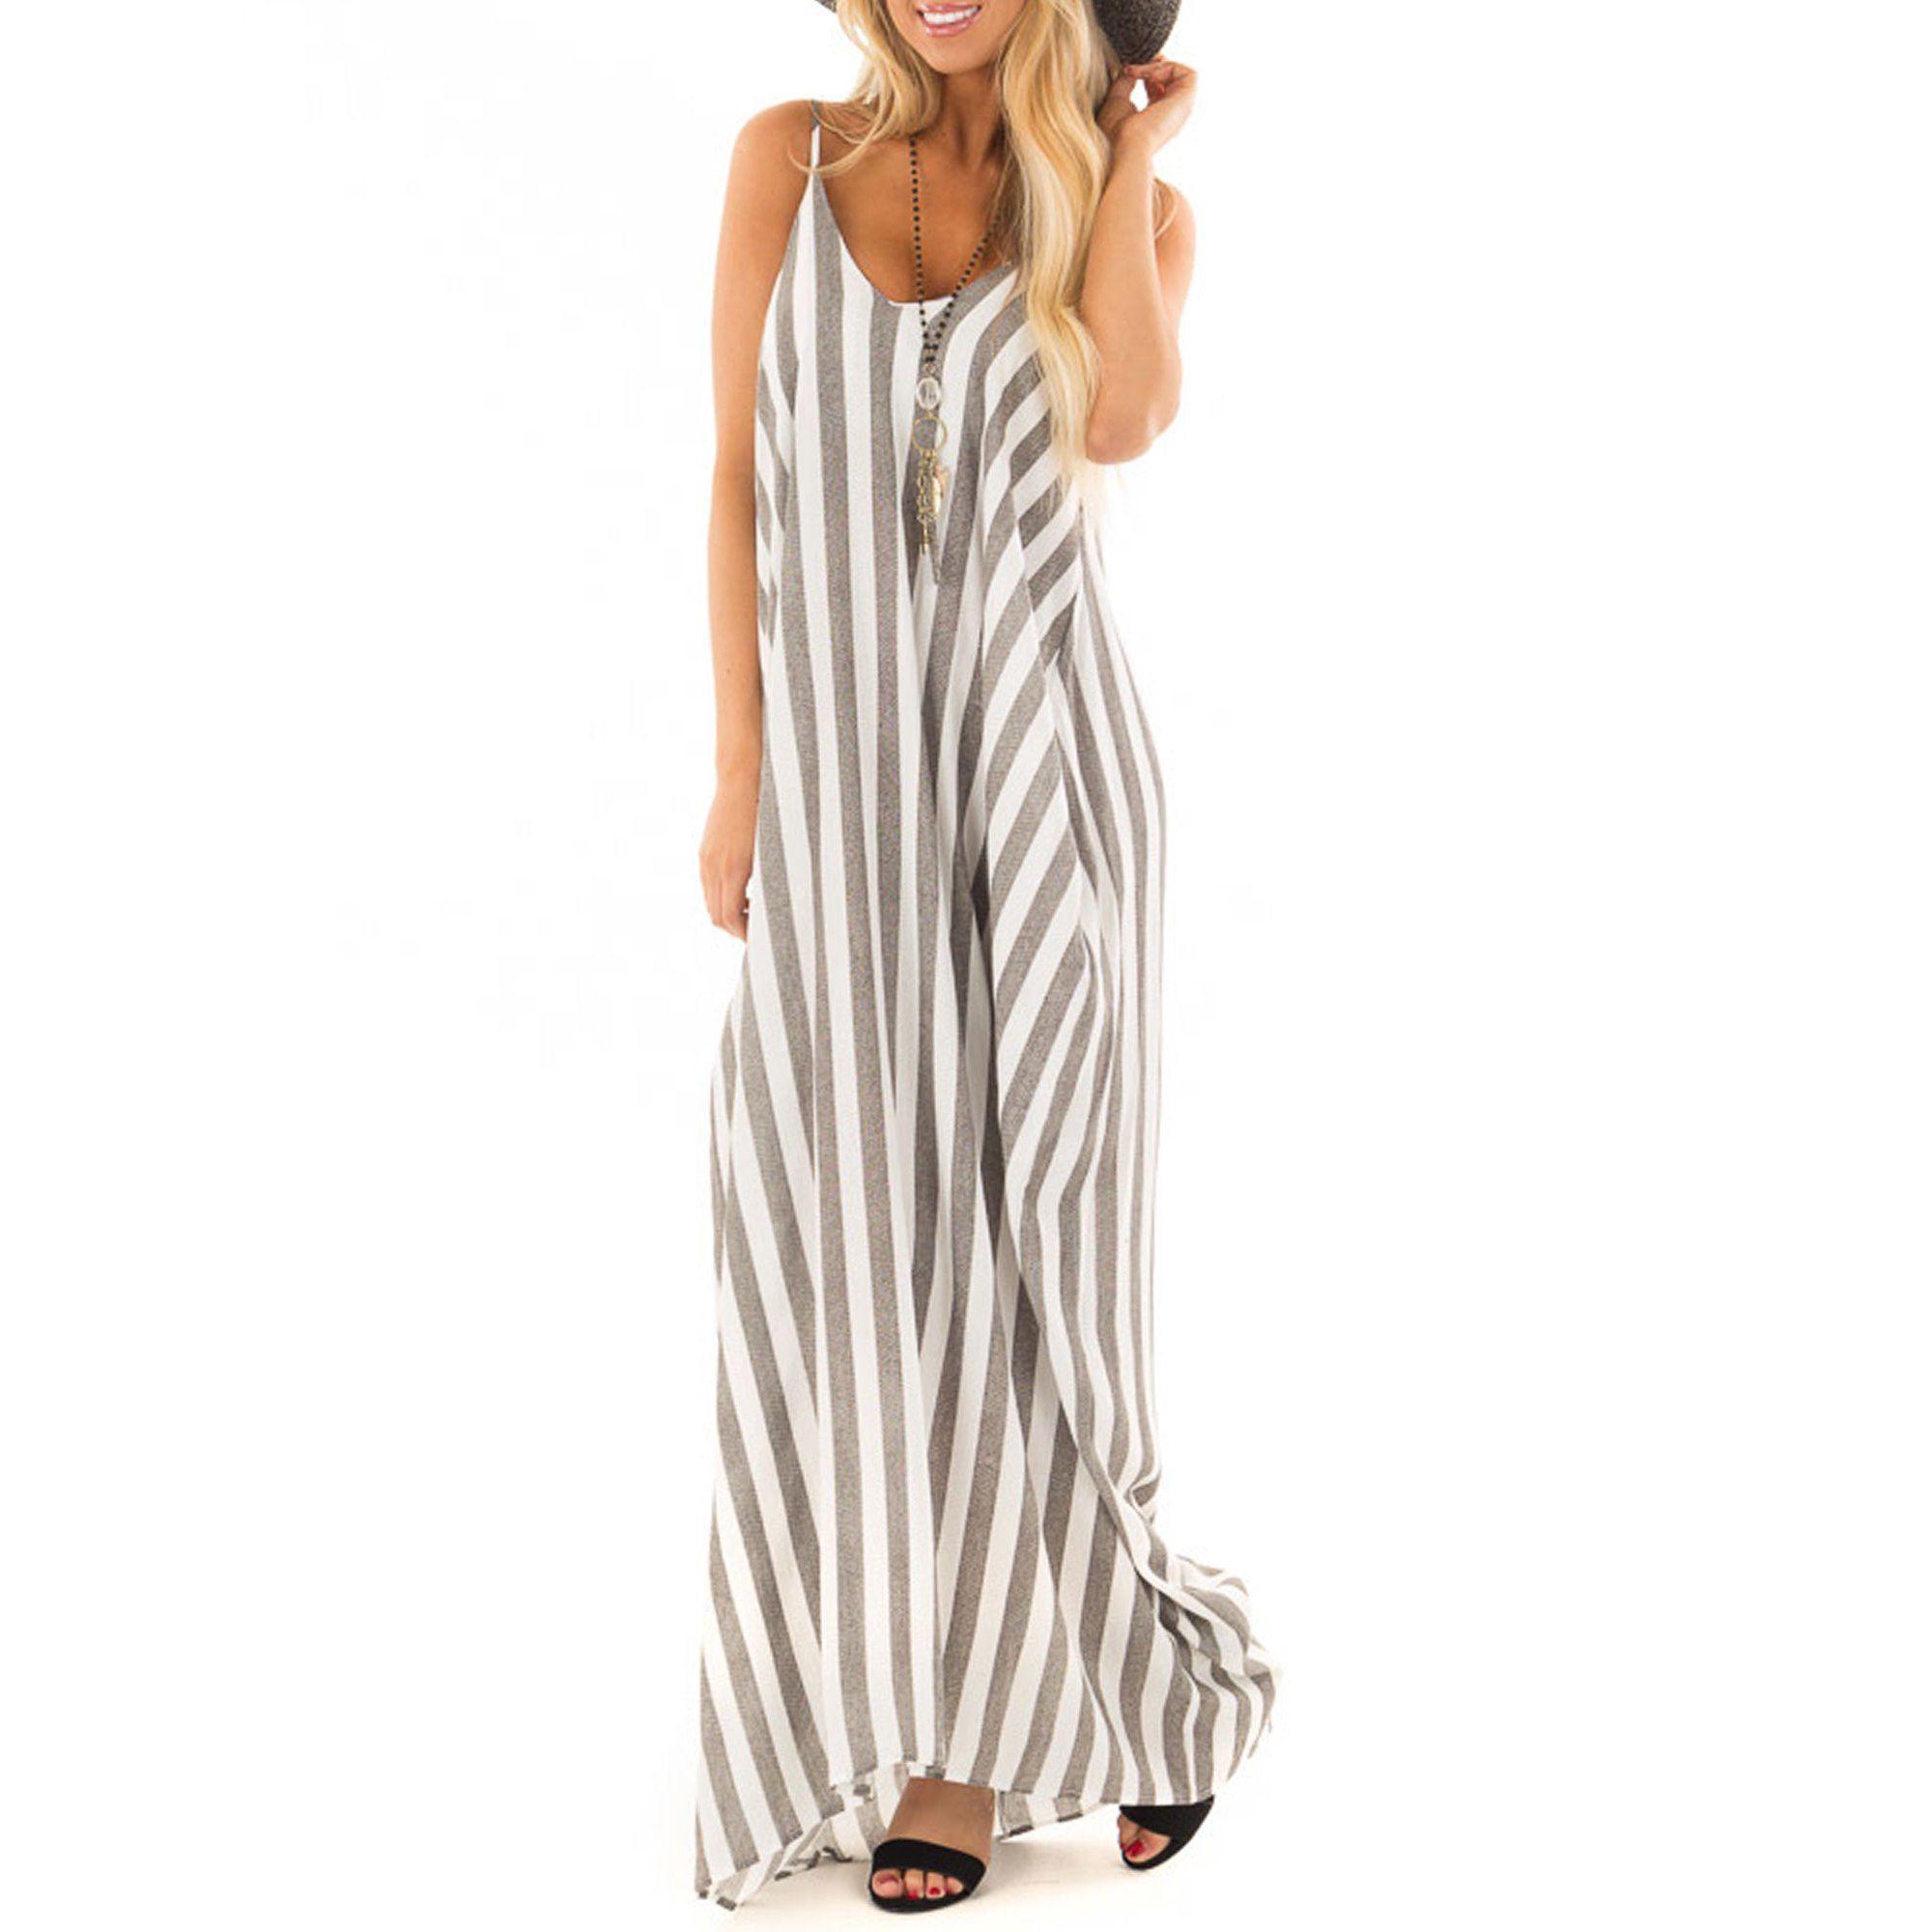 Ukap Women Boho Summer Striped Long Maxi Dress Loose Baggy Casual Beach Holiday Cocktail Party Spaghetti Strap Slin In 2021 Maxi Dress Style Maxi Dress Maxi Sundress [ 2000 x 2000 Pixel ]